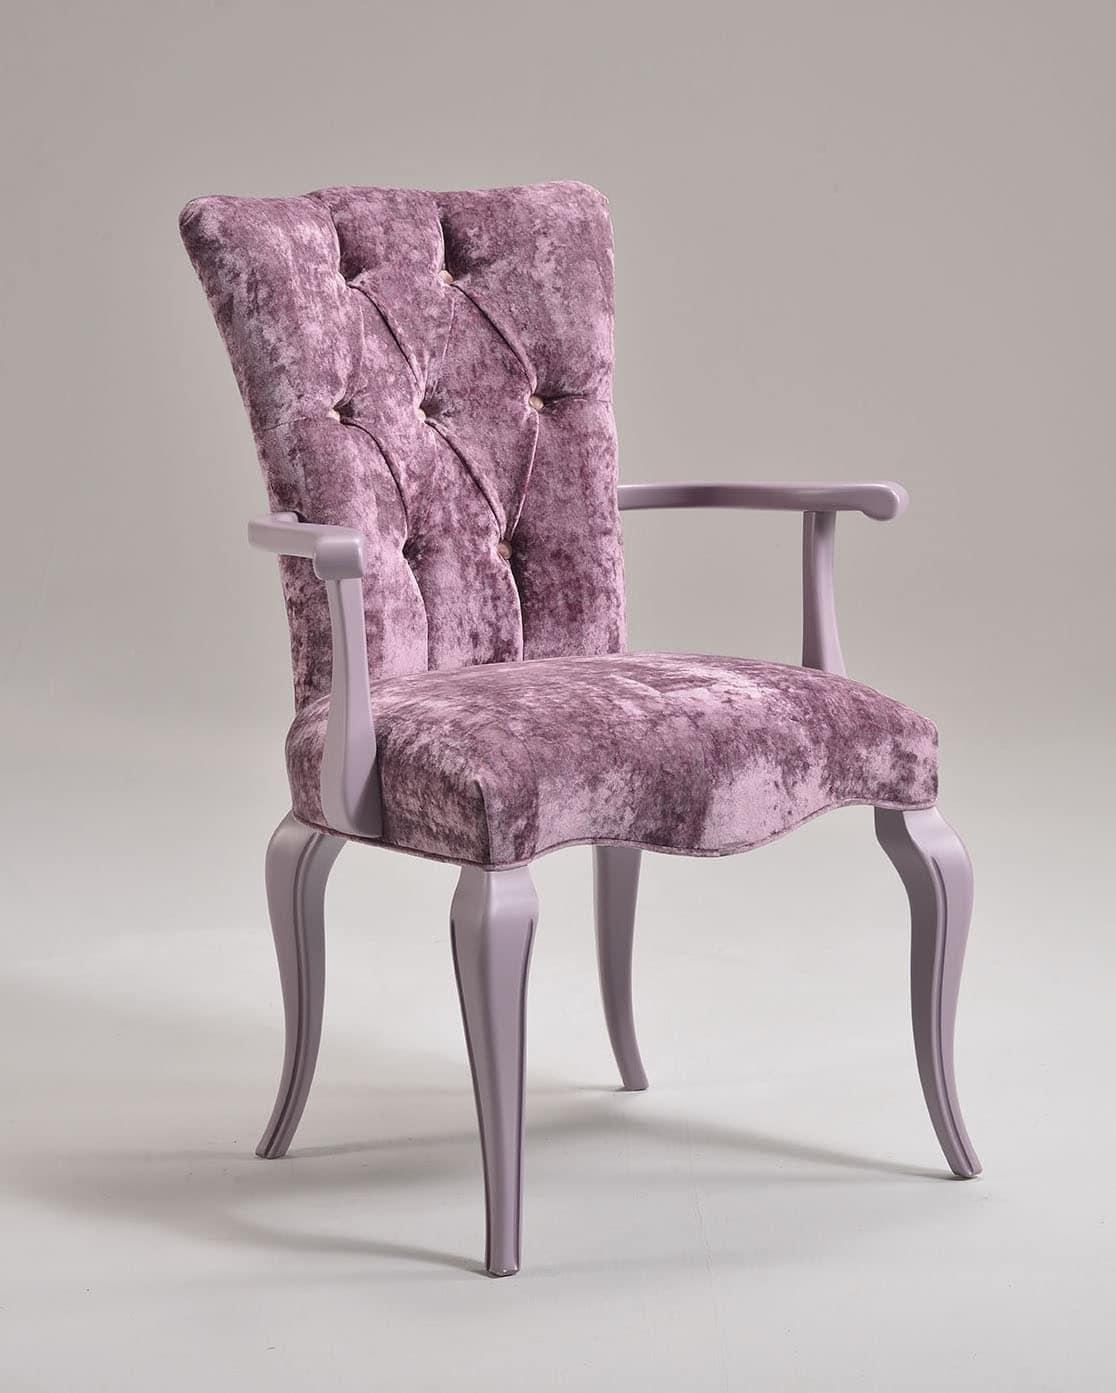 sessel mit gesteppter polsterung luxus im klassischen. Black Bedroom Furniture Sets. Home Design Ideas